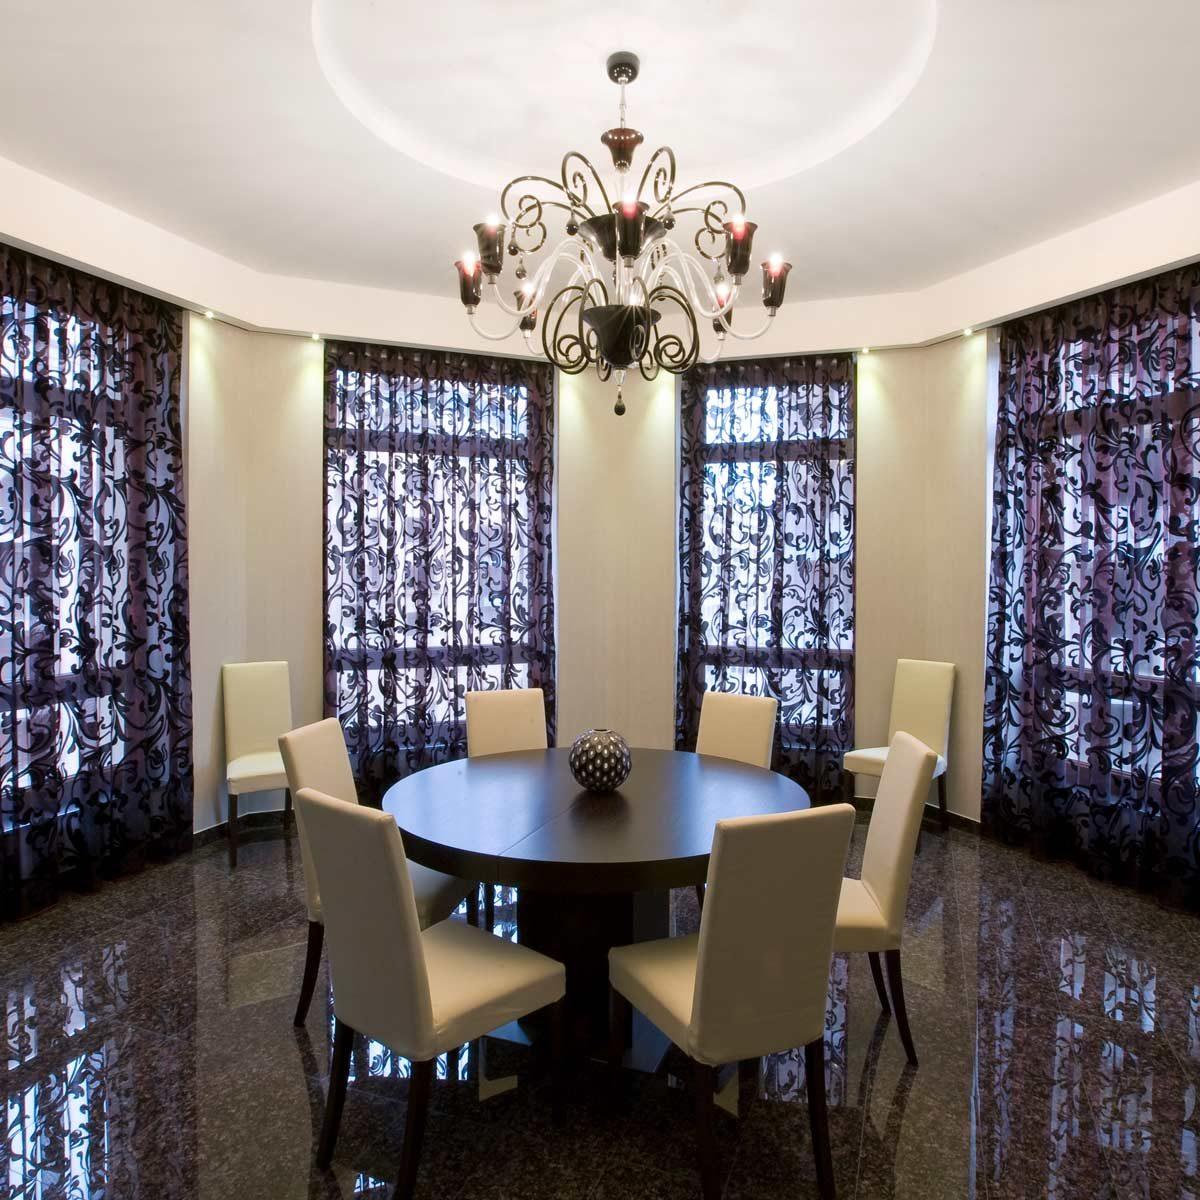 Stylish Dining Room Curtain Ideas | Family Handyman on Dining Room Curtain Ideas  id=35905